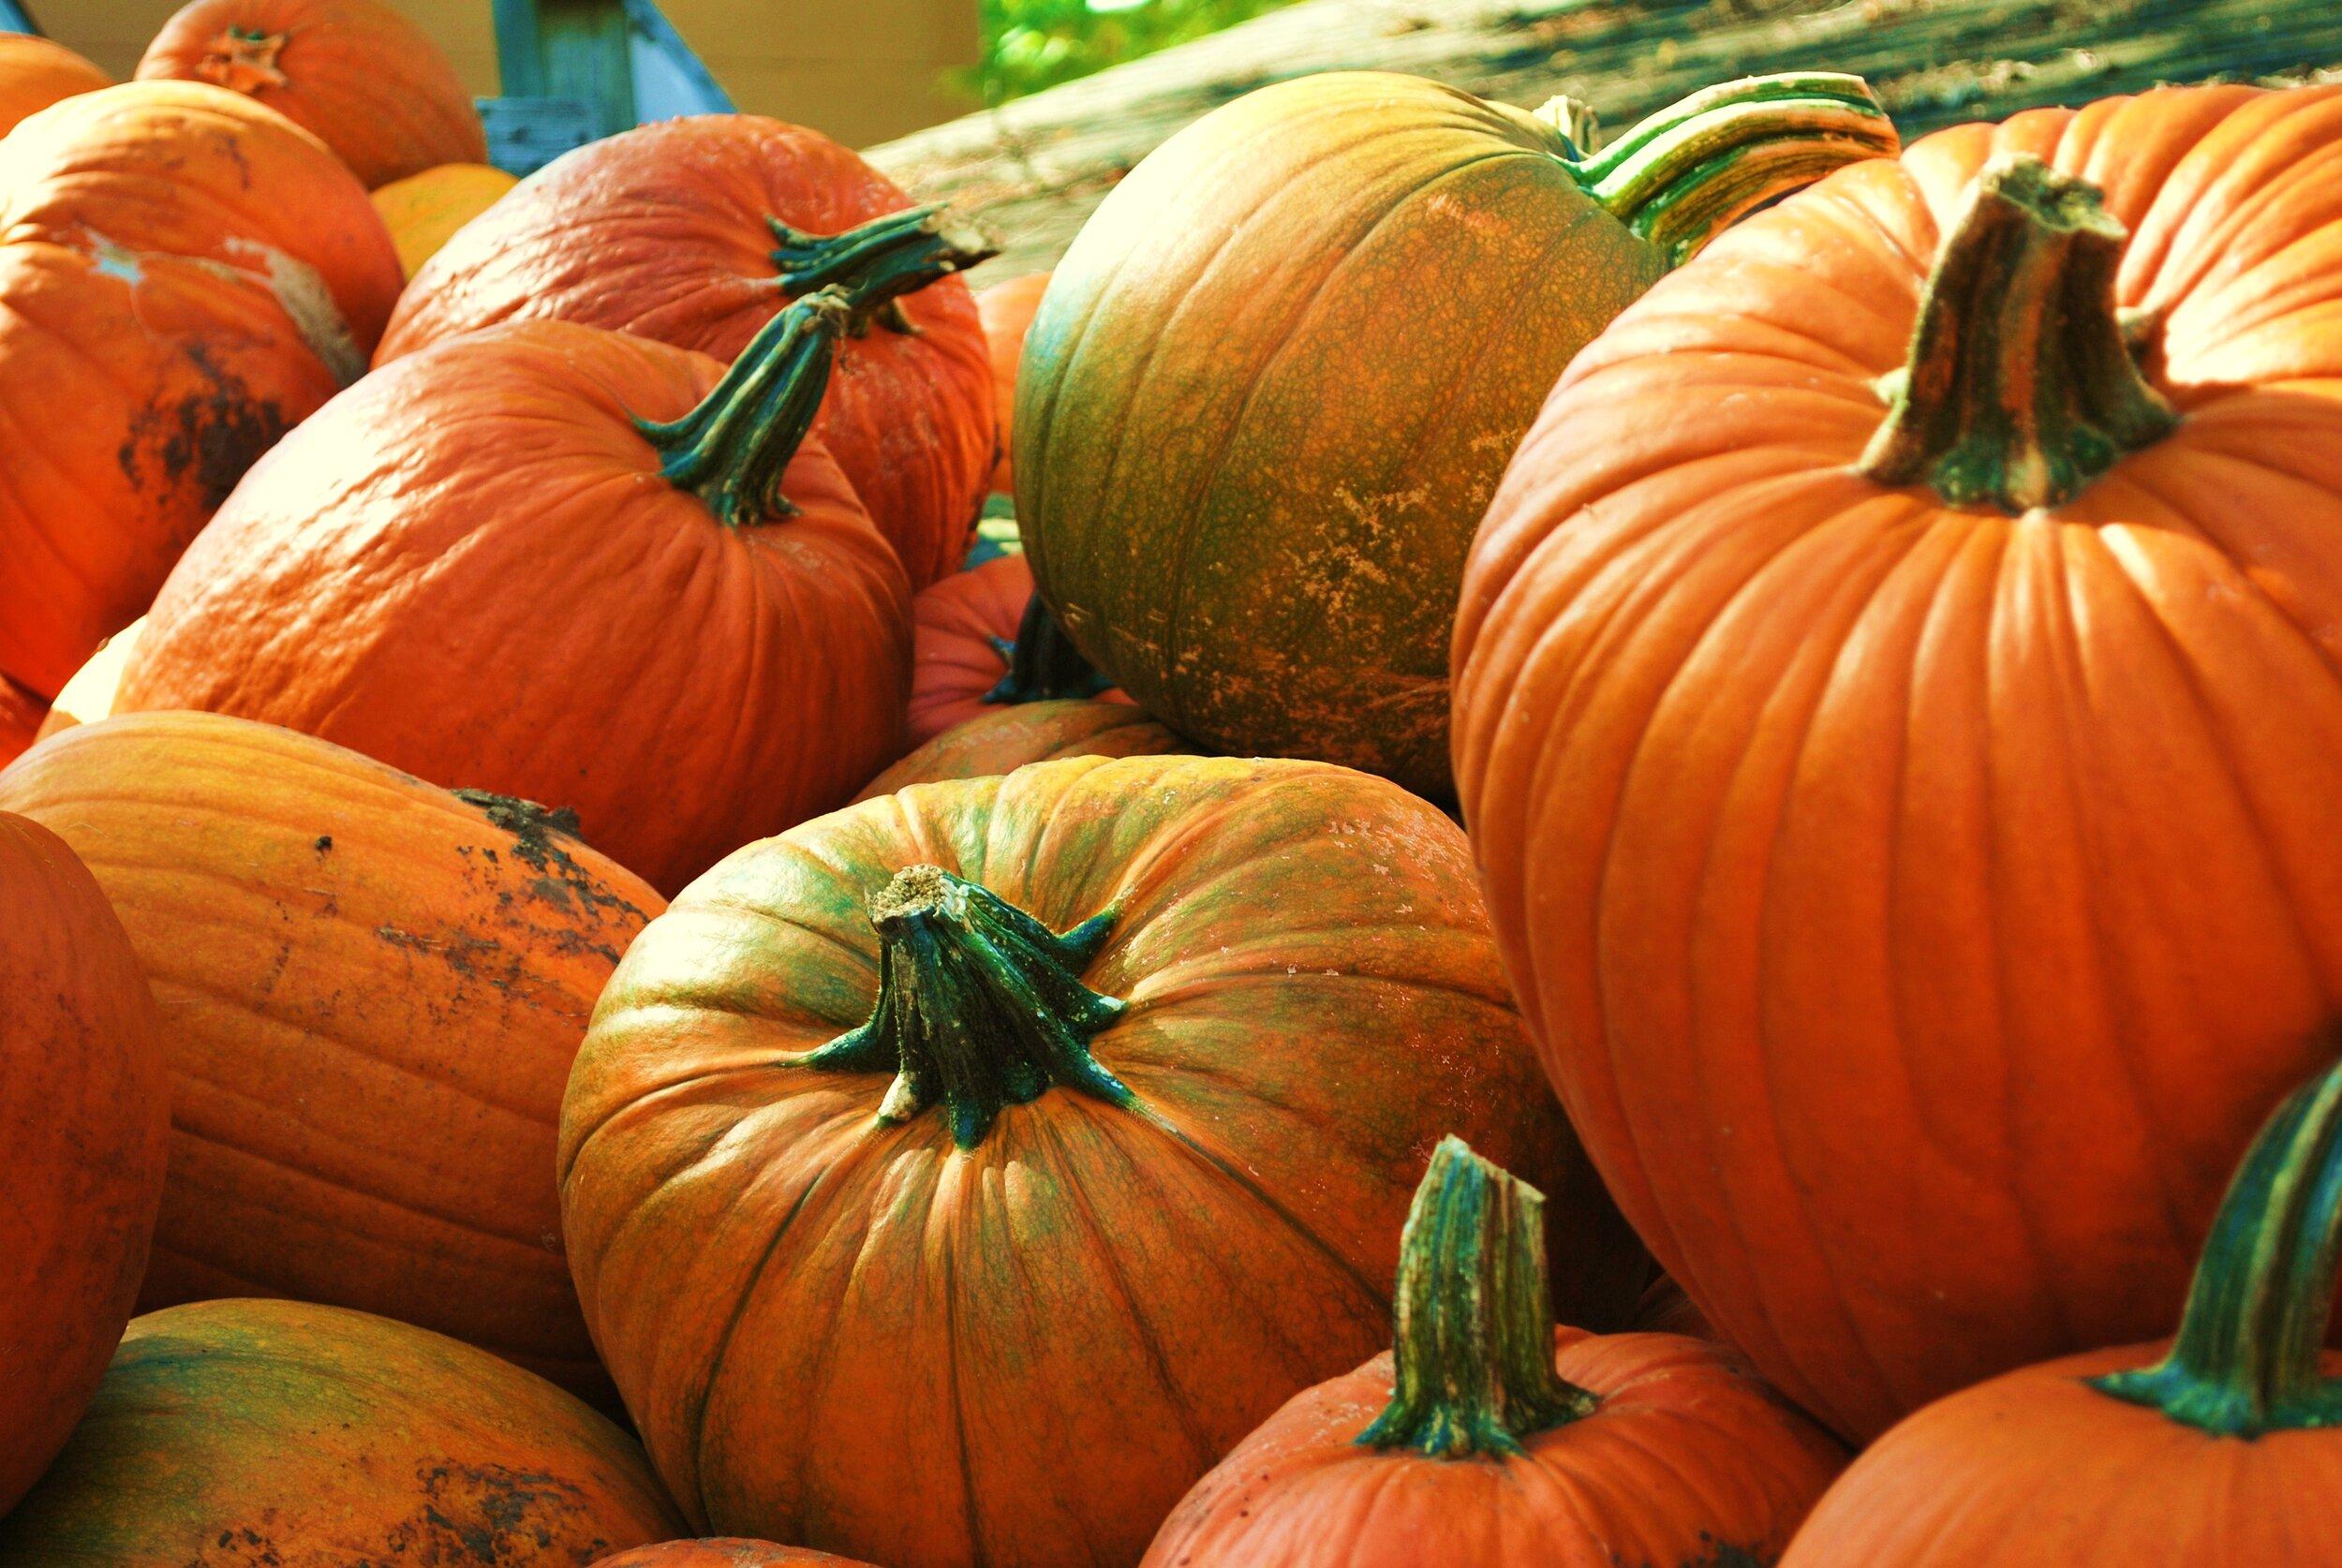 orange-pumpkins-haloween-harvest-variation-rural-farm.jpg